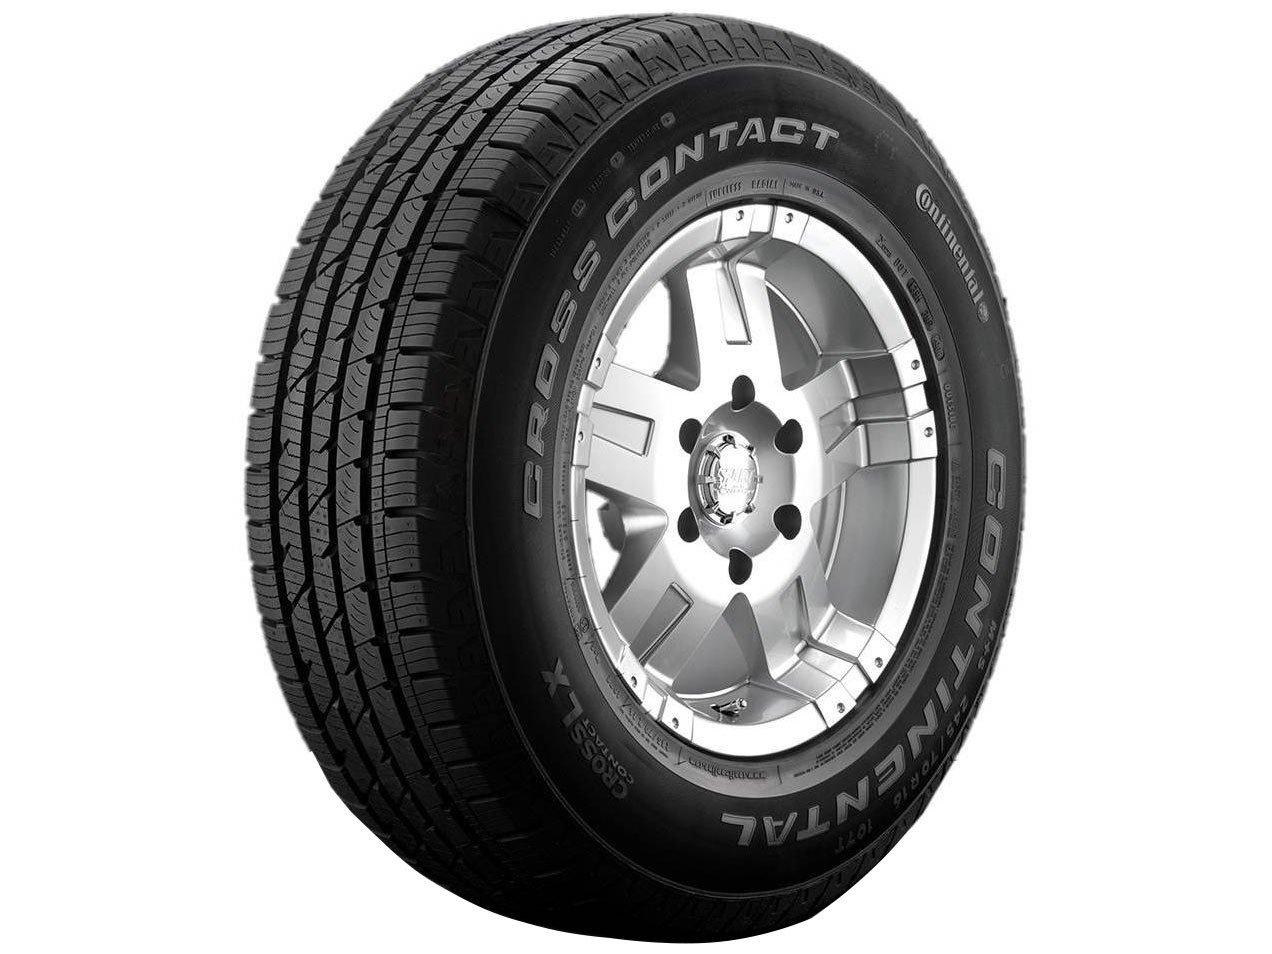 pneu aro 16 continental 245 70r16 crosscontact lx 111t pneus carros aro 16 magazine luiza. Black Bedroom Furniture Sets. Home Design Ideas